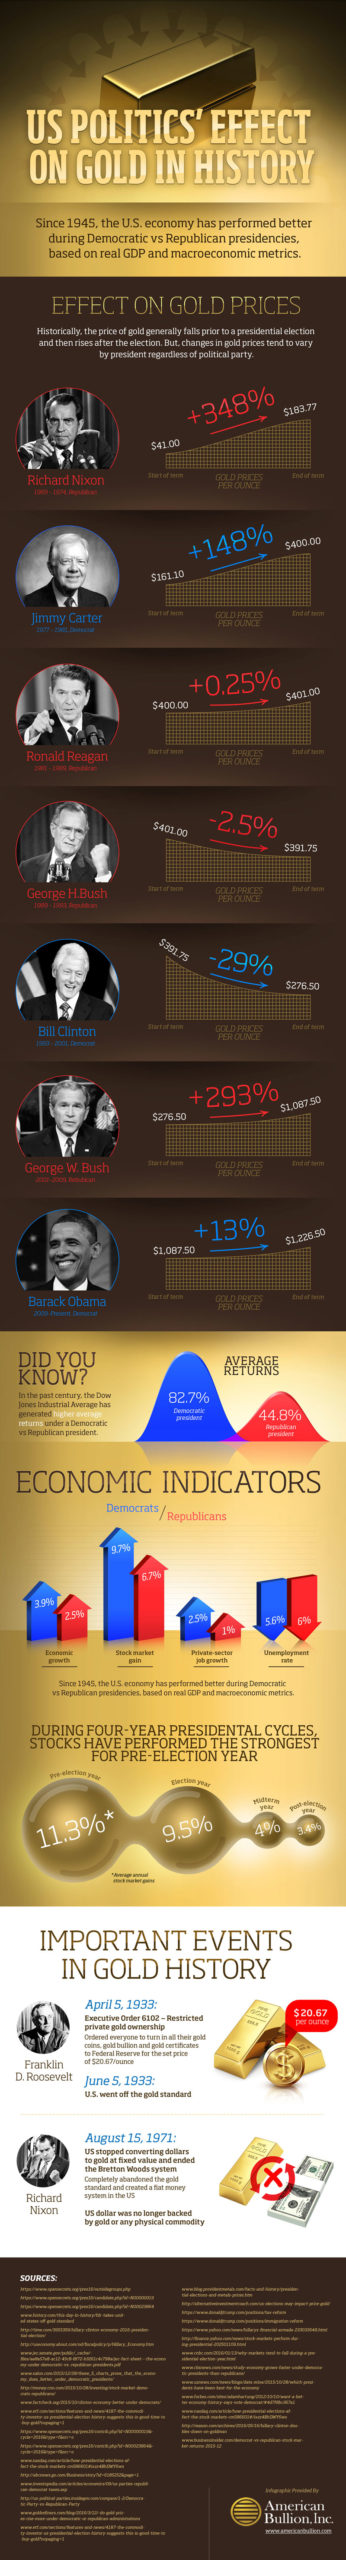 us politics effect gold